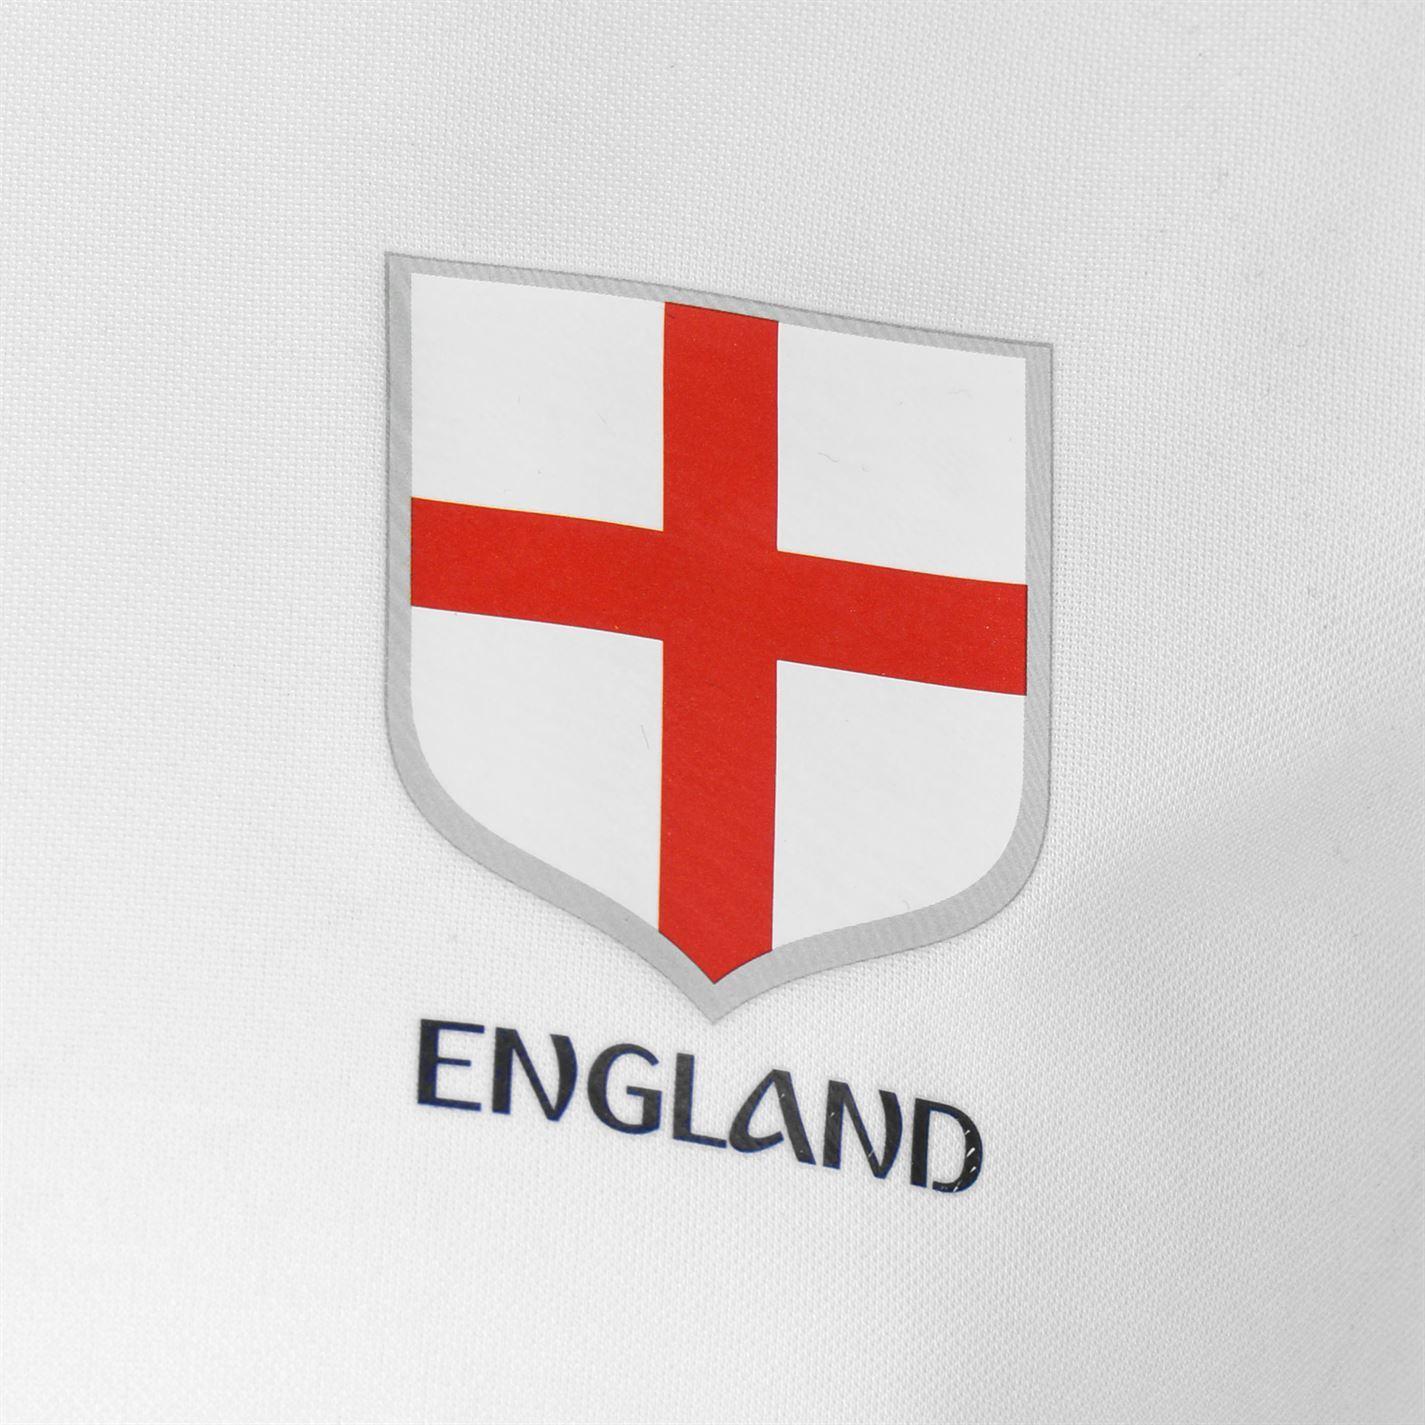 miniature 9 - FIFA Coupe du monde 2018 Angleterre T-Shirt Homme Football Soccer tee shirt top